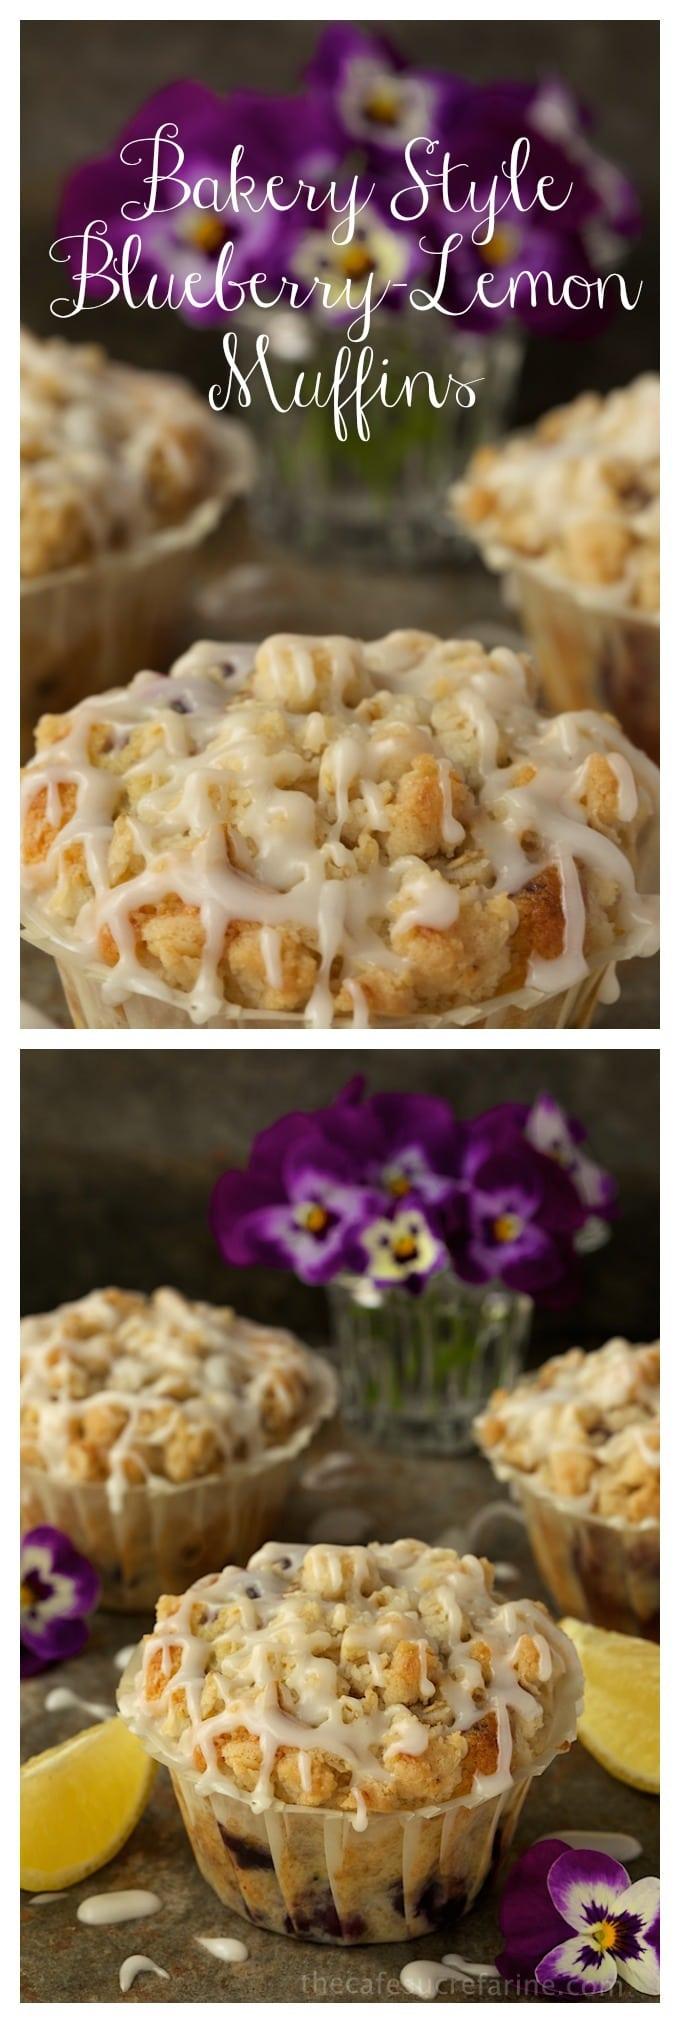 Bakery Style Blueberry-Lemon Muffins